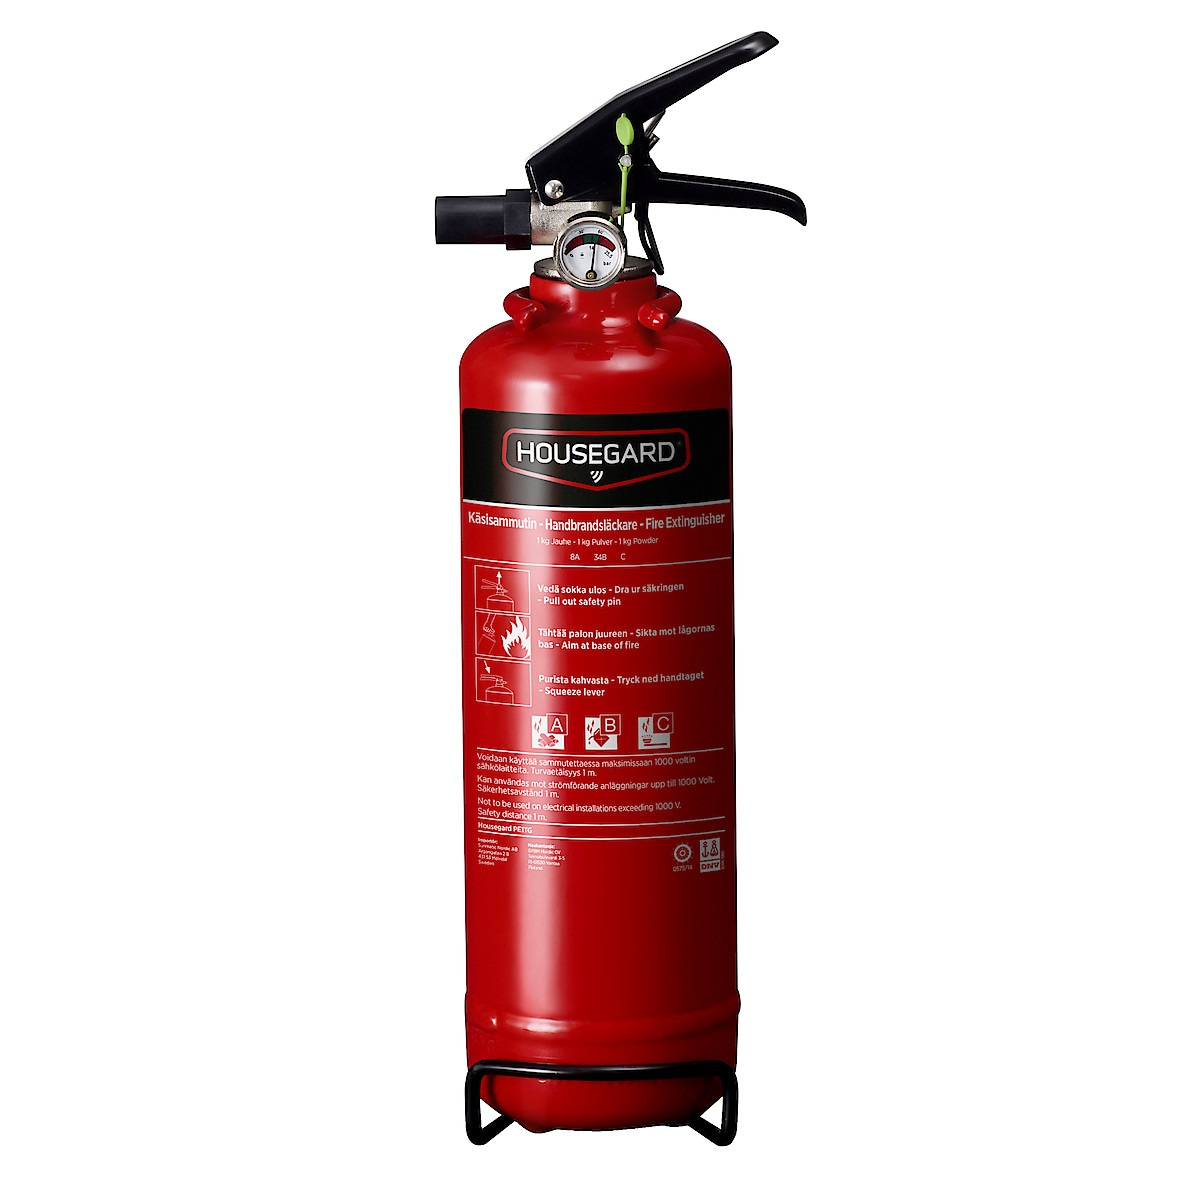 Brandsläckare 1 kg Housegard